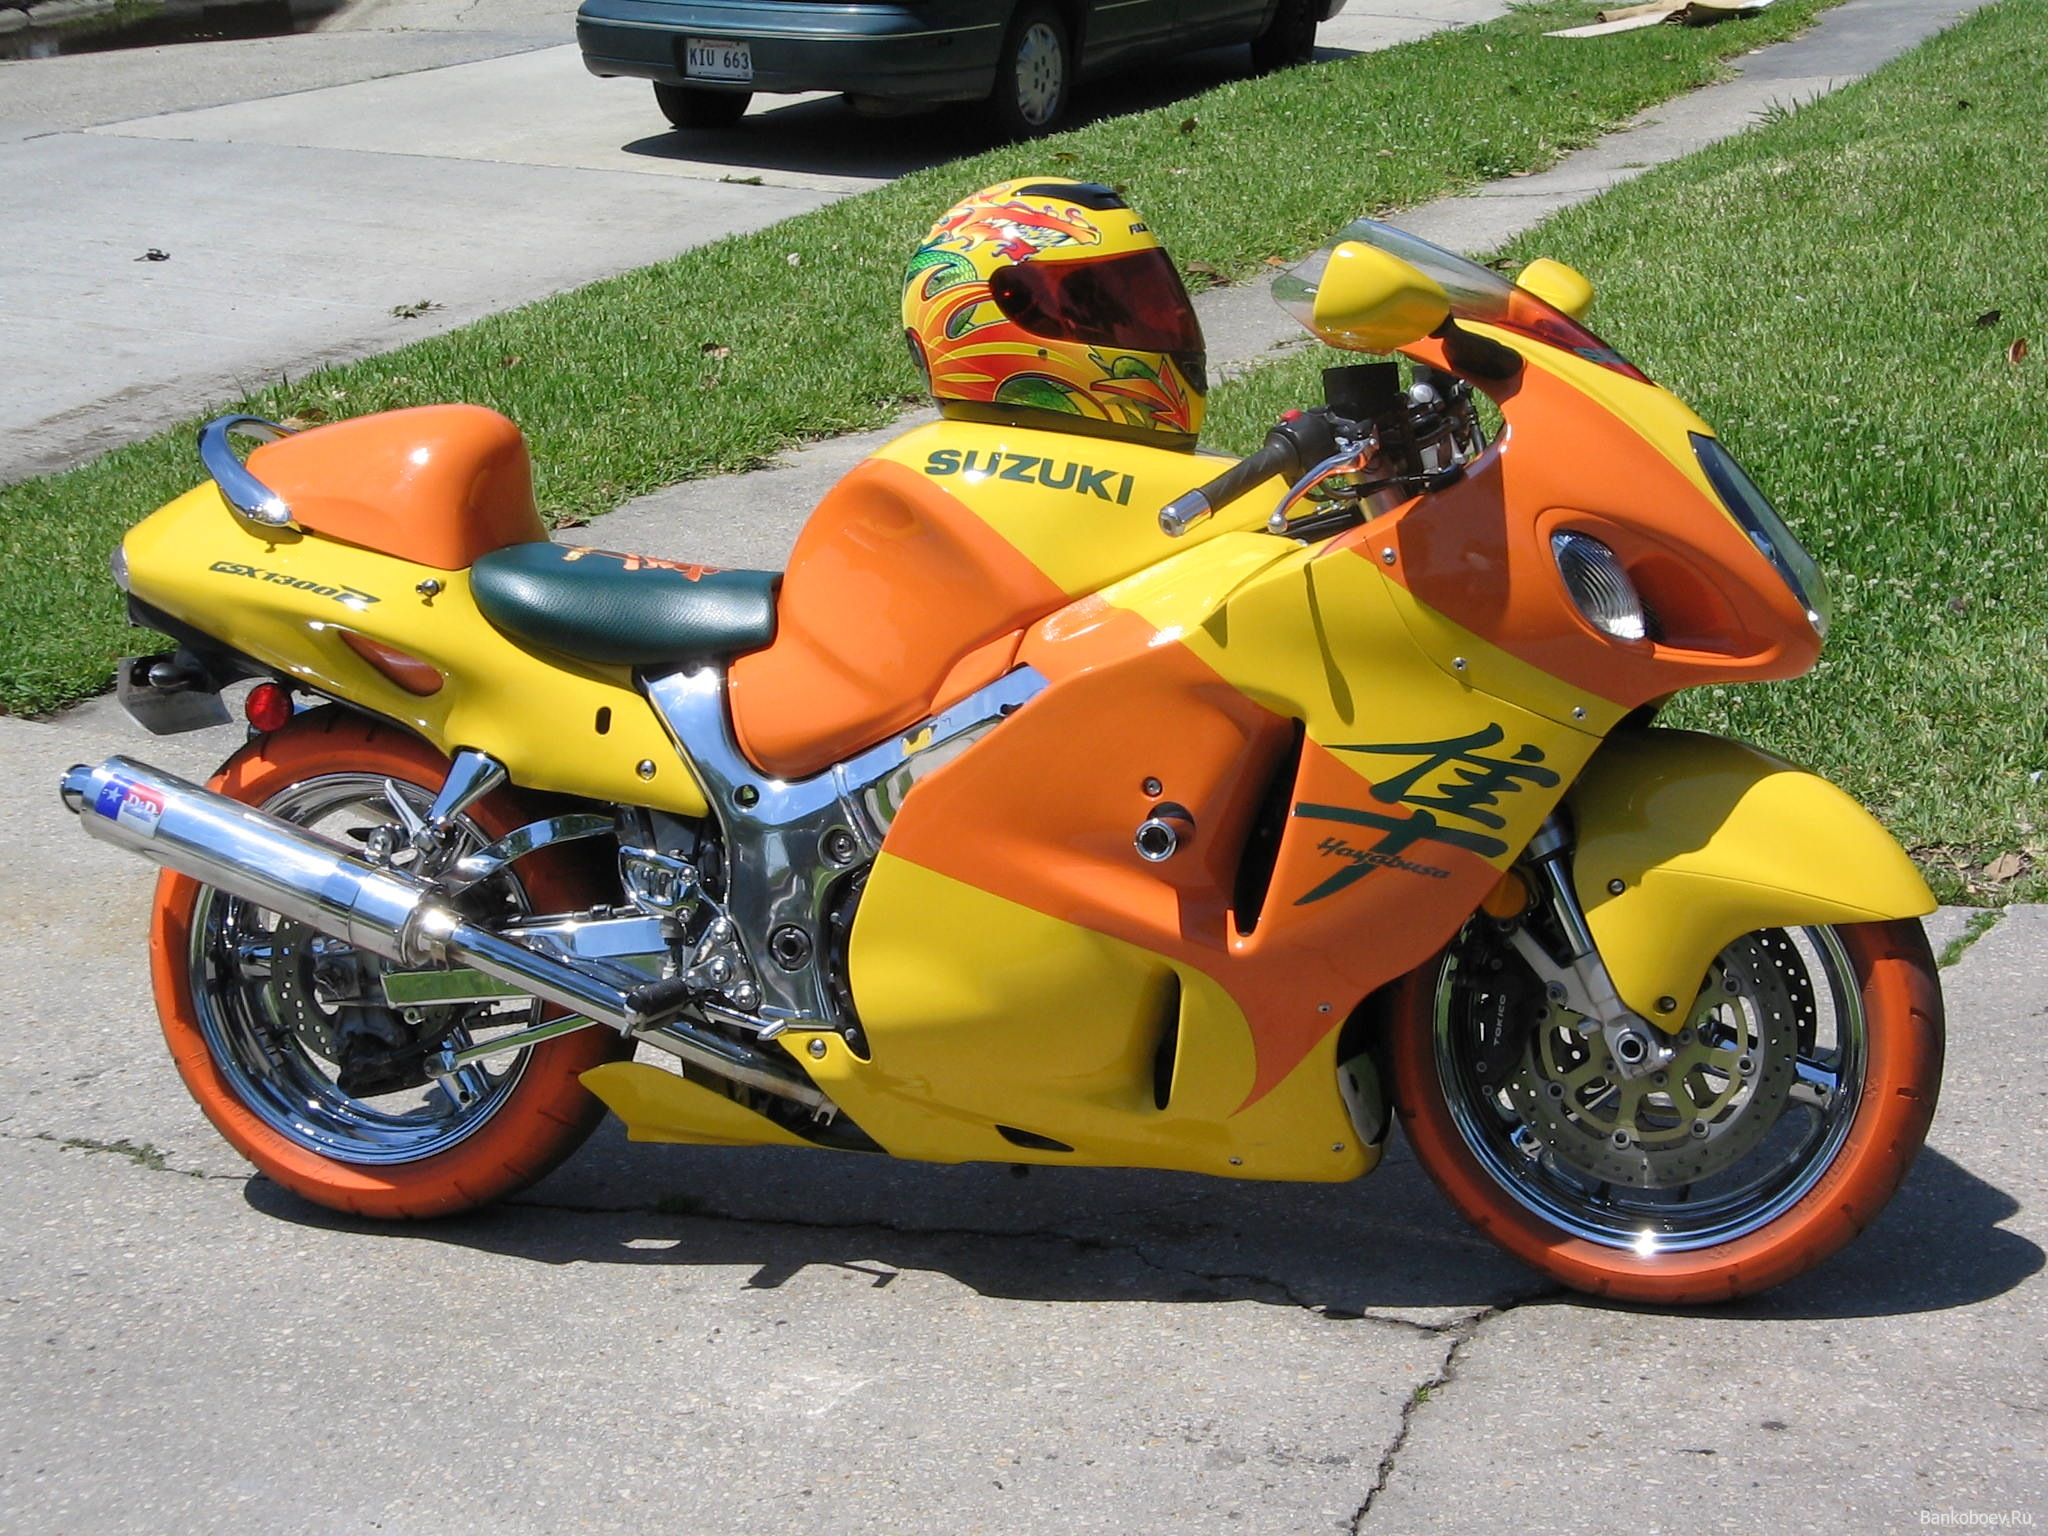 hayabusa tuning motorbikes 2560 - photo #22